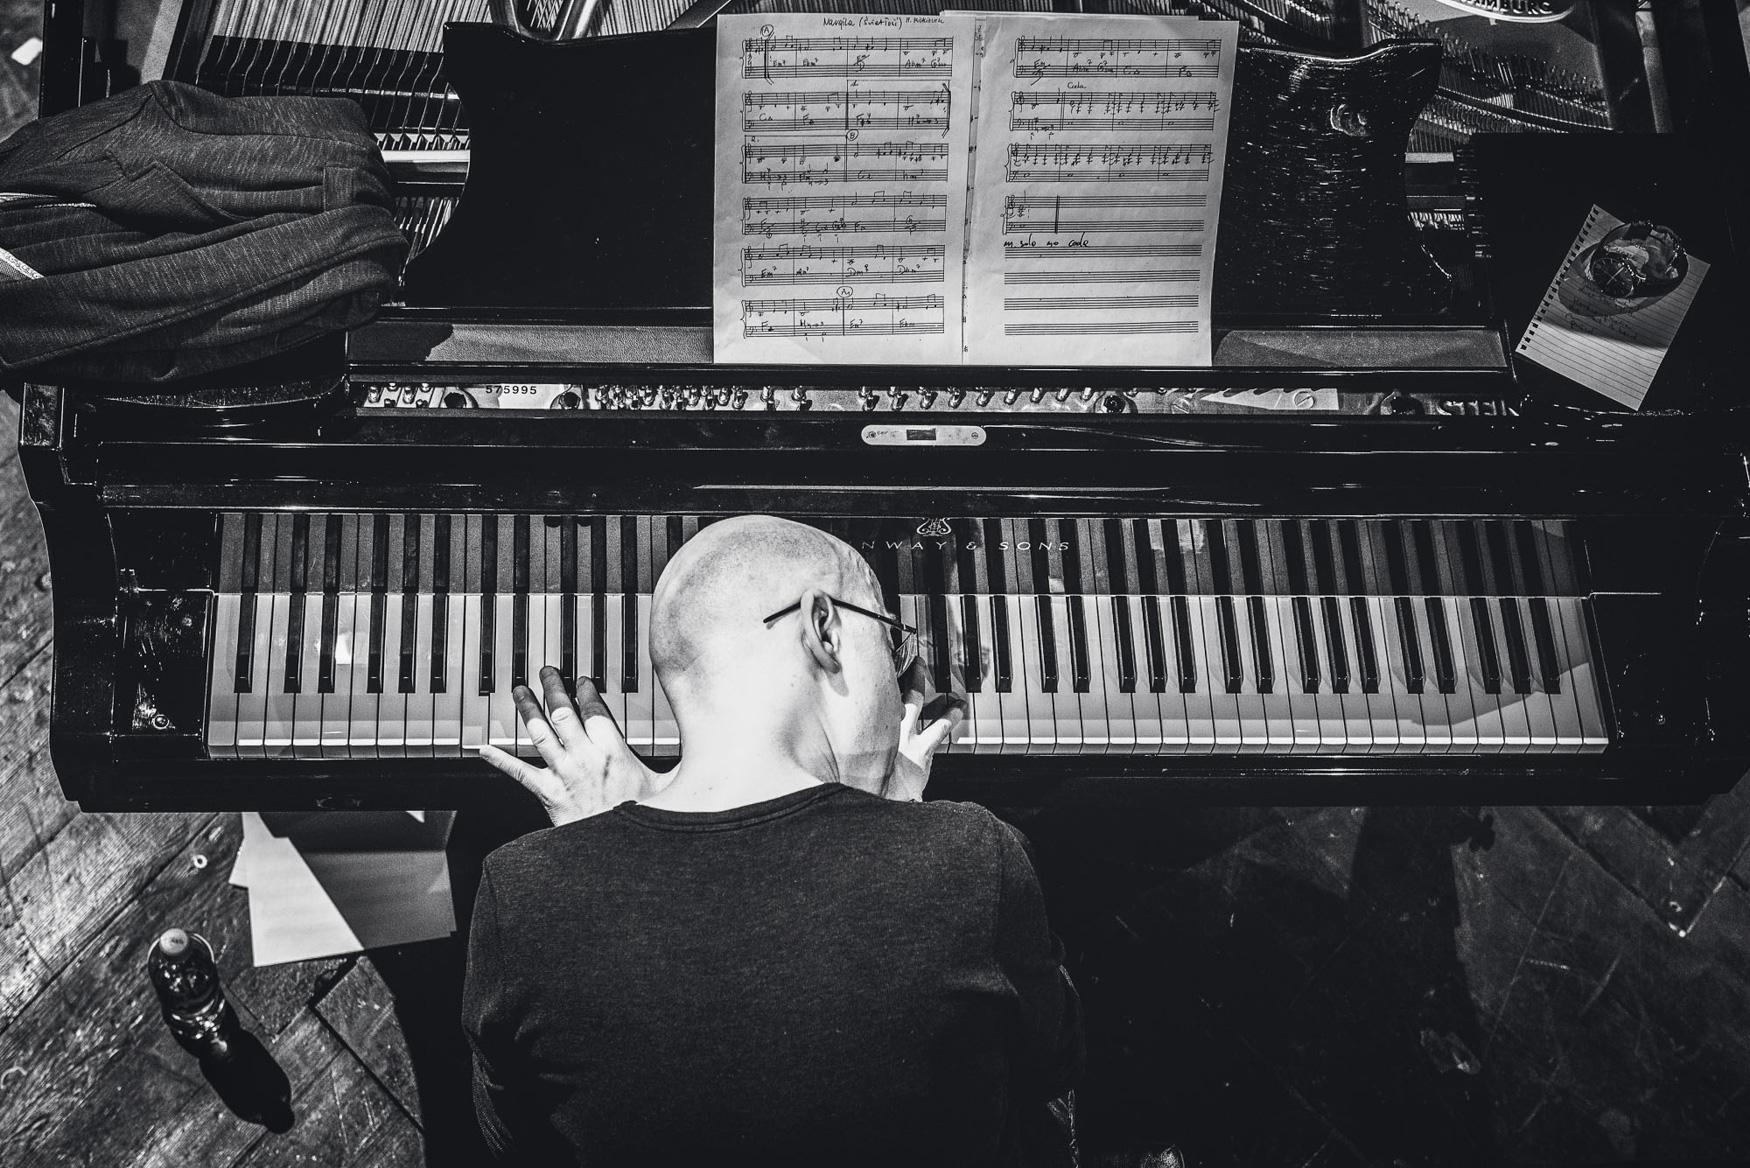 Marcin Wasilewski, fot. Maciej Kanik